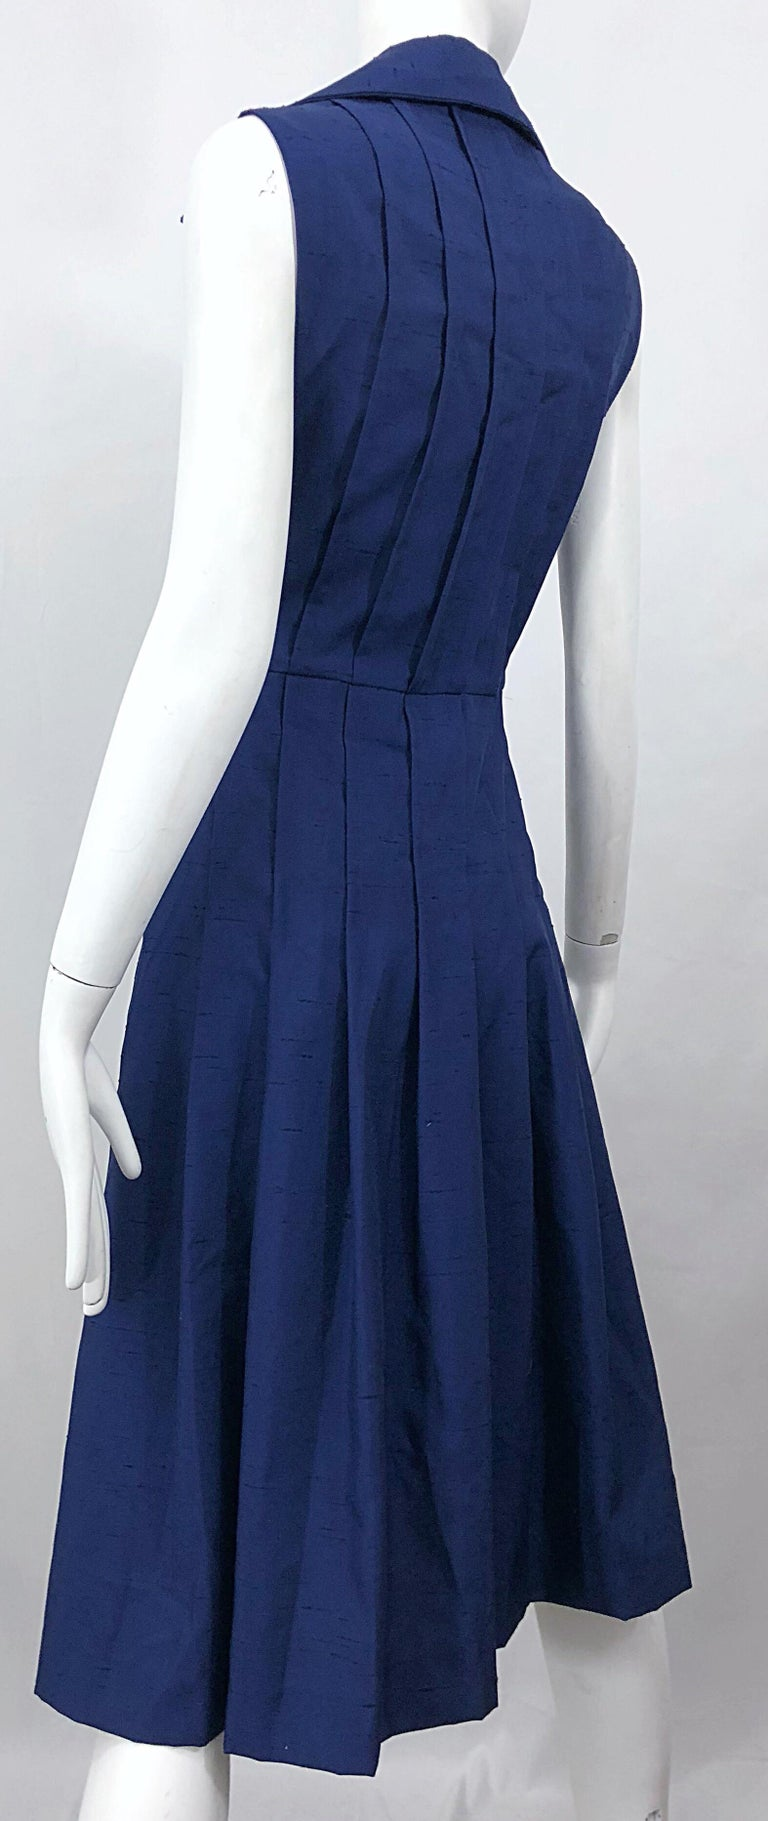 1990s Saks 5th Avenue Size 10 Navy Blue Silk Vintage 90s Sleeveless Shirt Dress For Sale 2